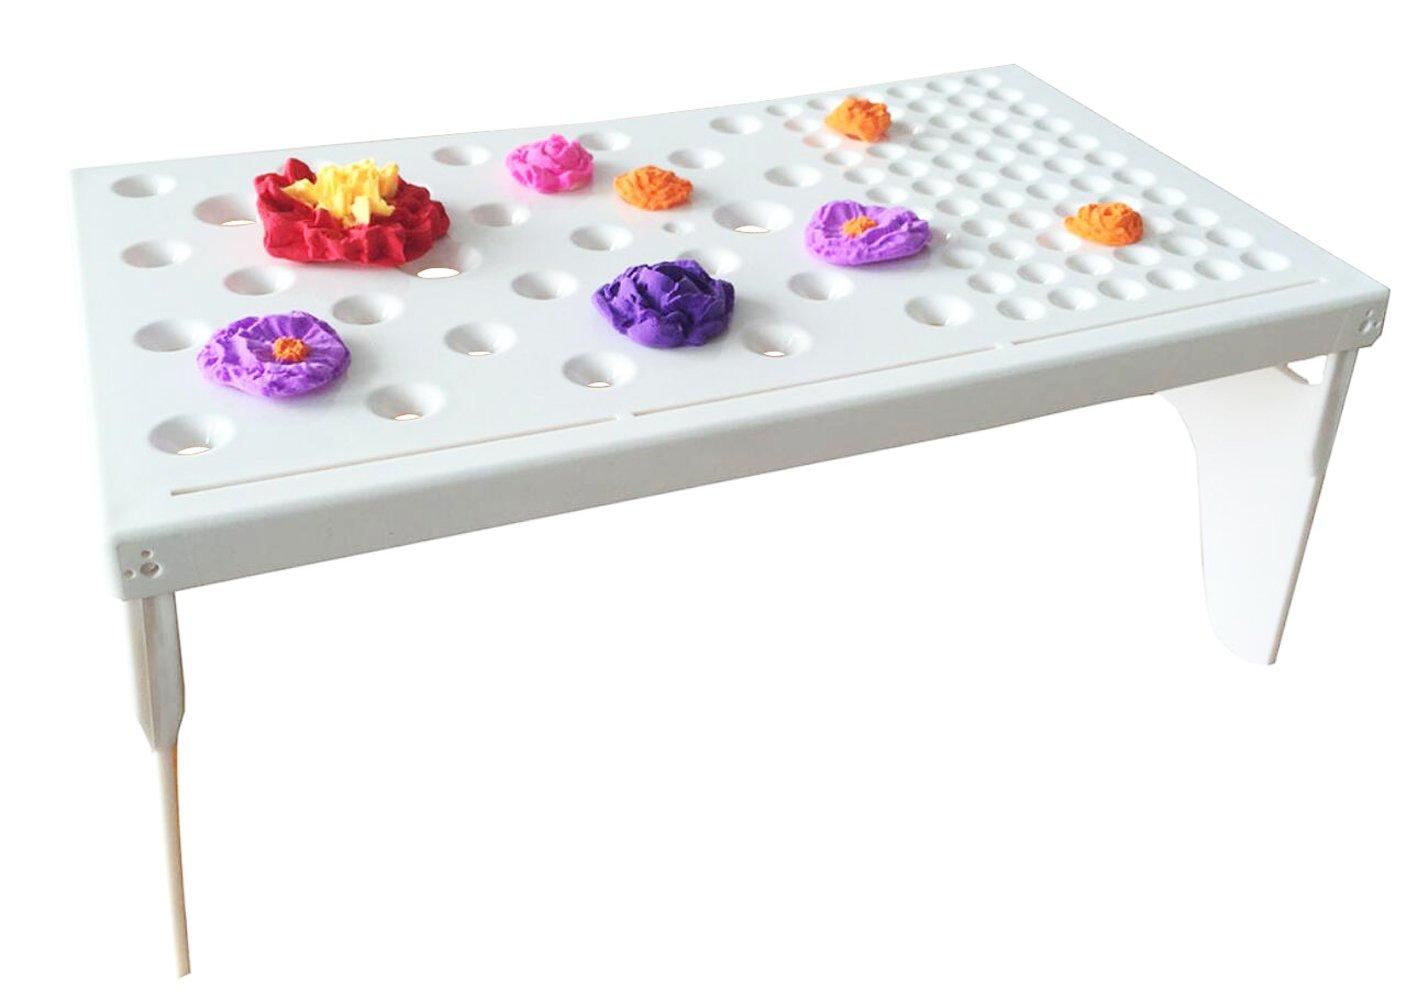 Fondant Drying Moulds Mat Table, Fondant Forming Cups Flower Drying Moulds Flower Cup Holder Cake Decorating Tools